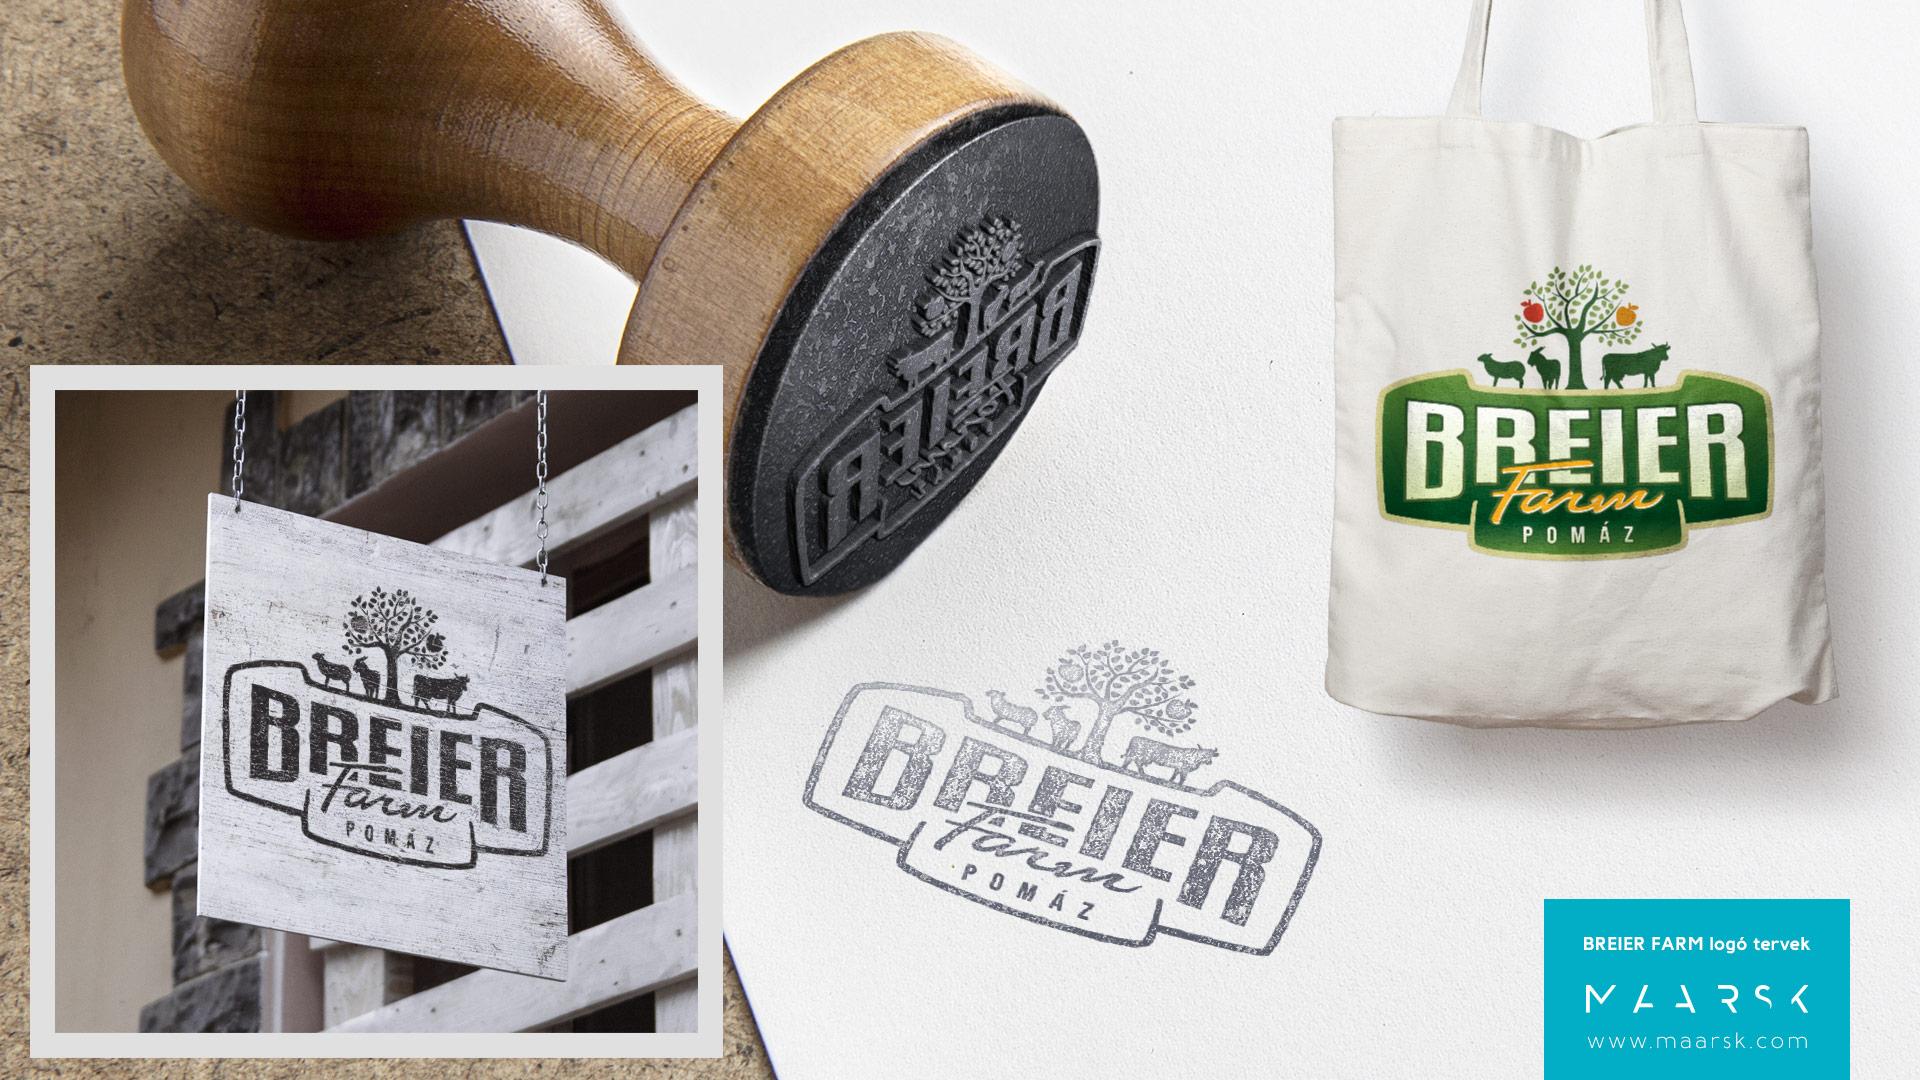 Breier Farm logójának terve - Maarsk Graphics